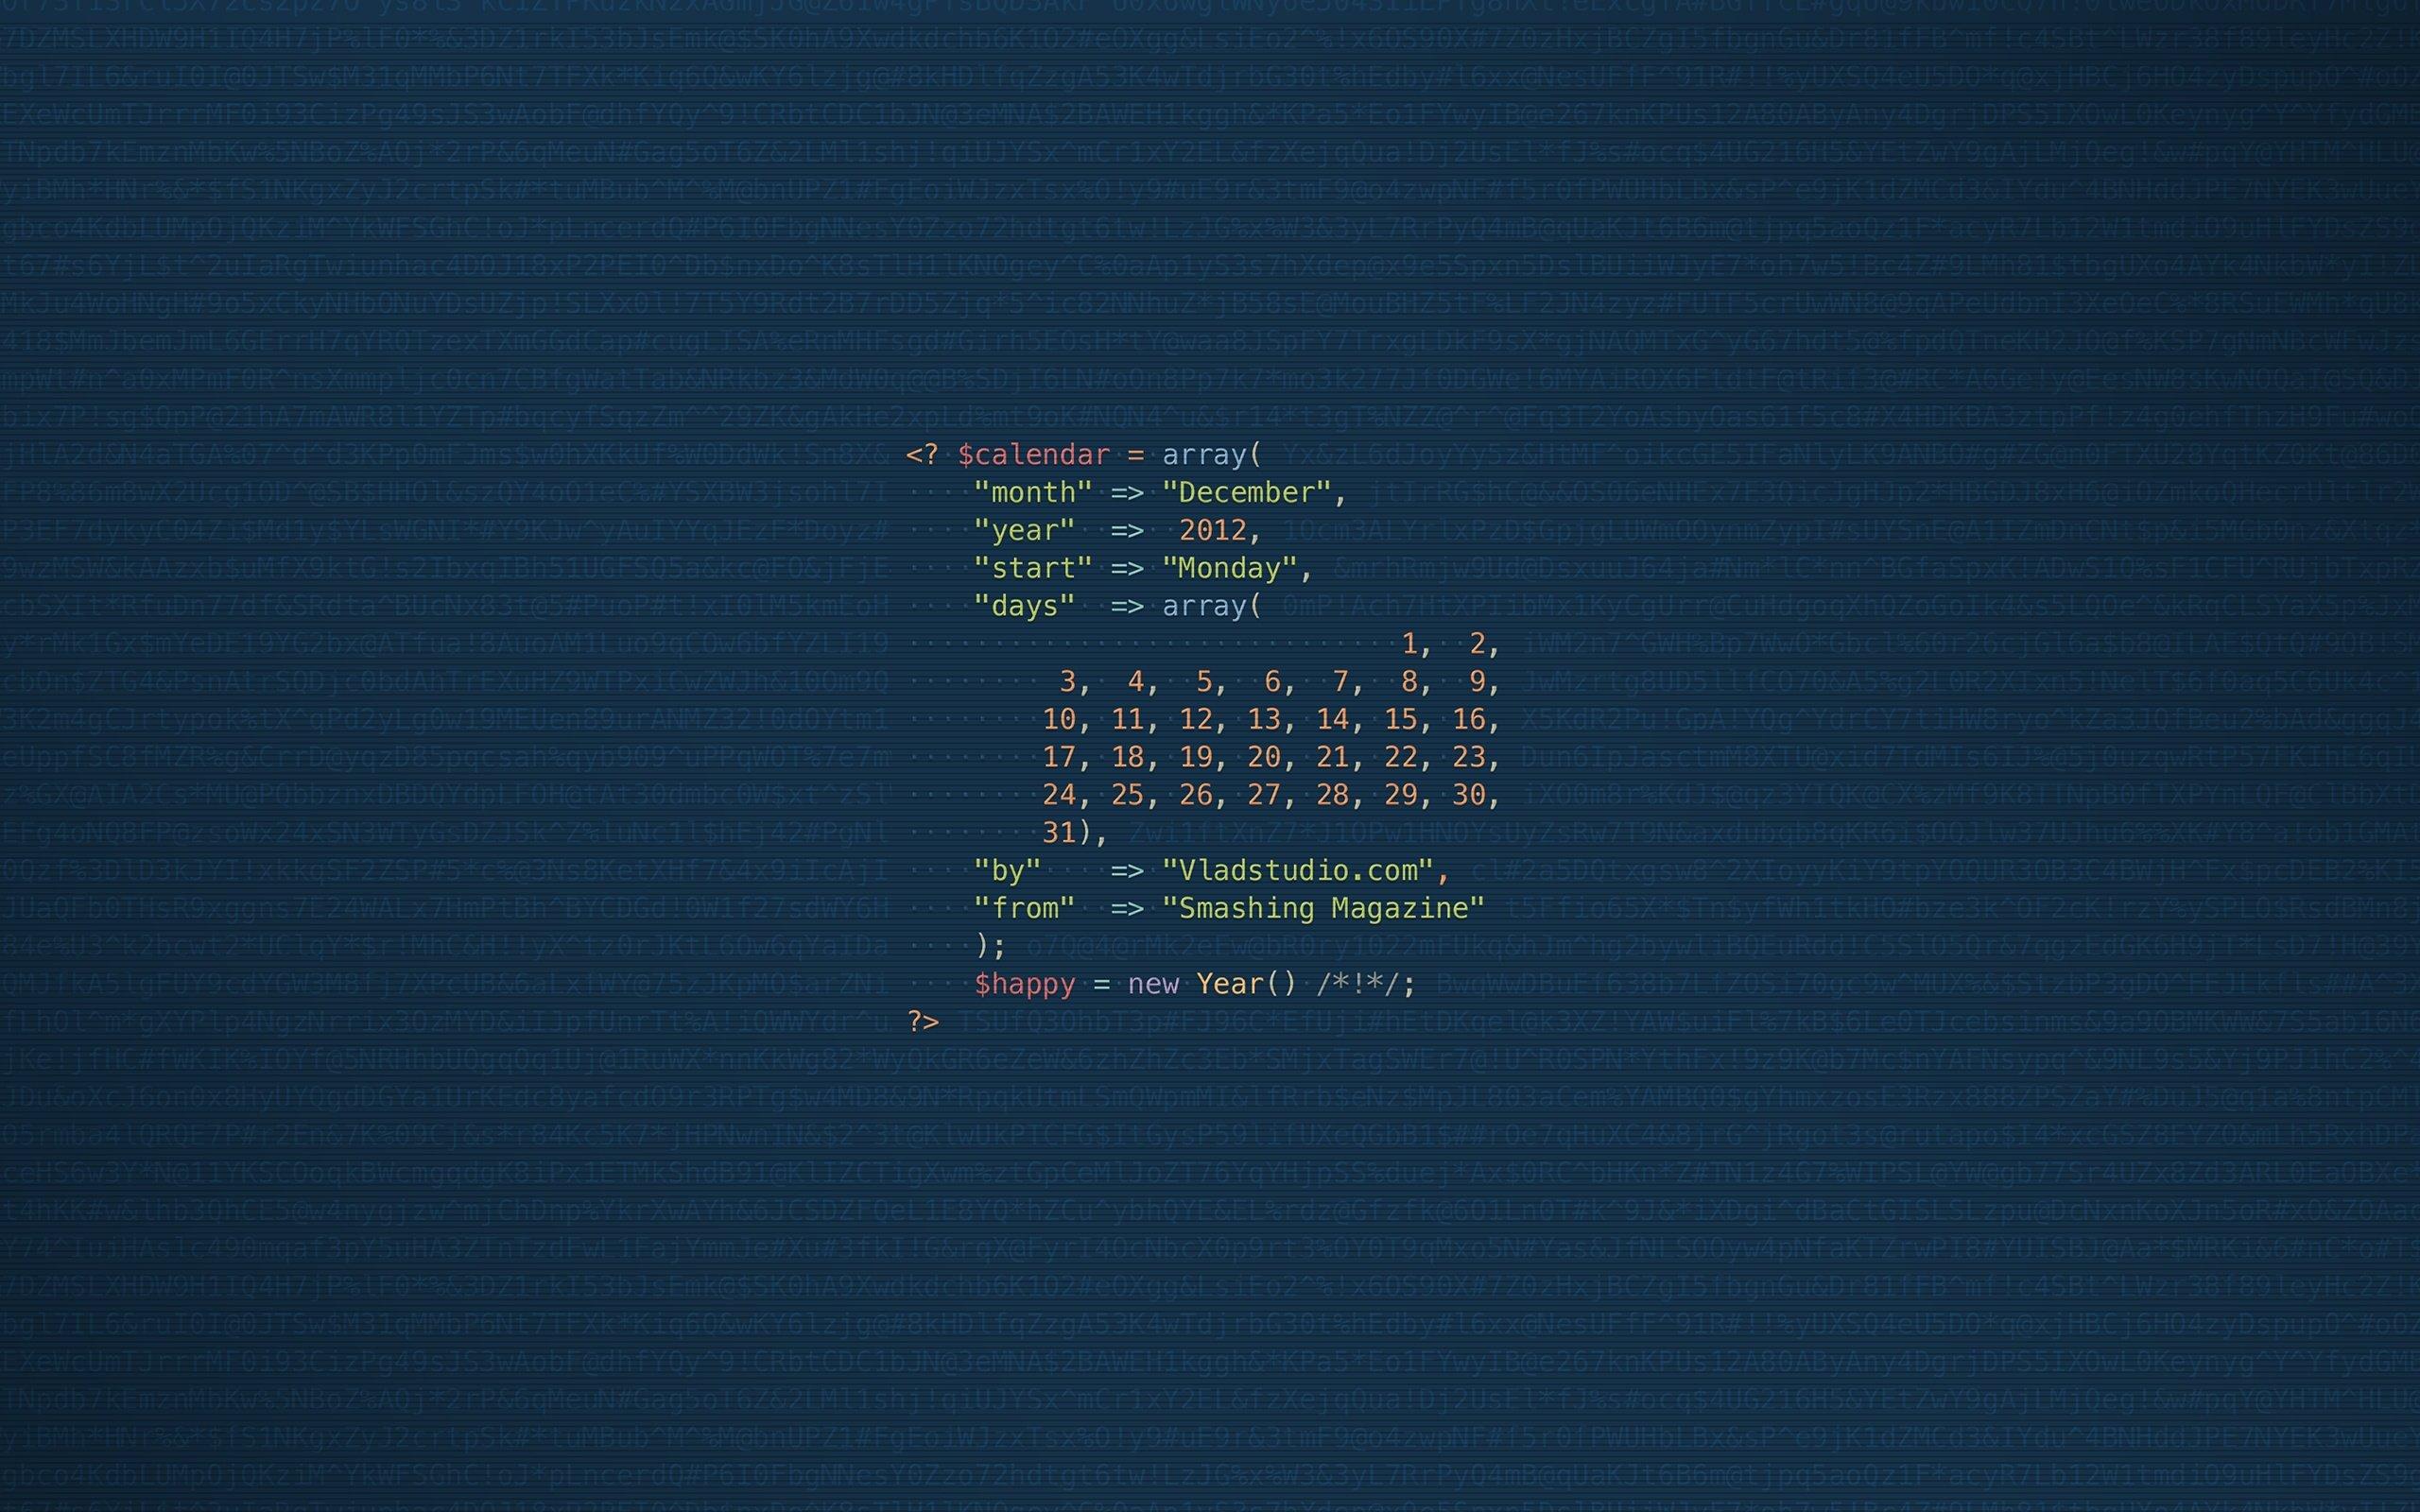 Programming Codes Wallpaper Code wallpaper 2560x1600